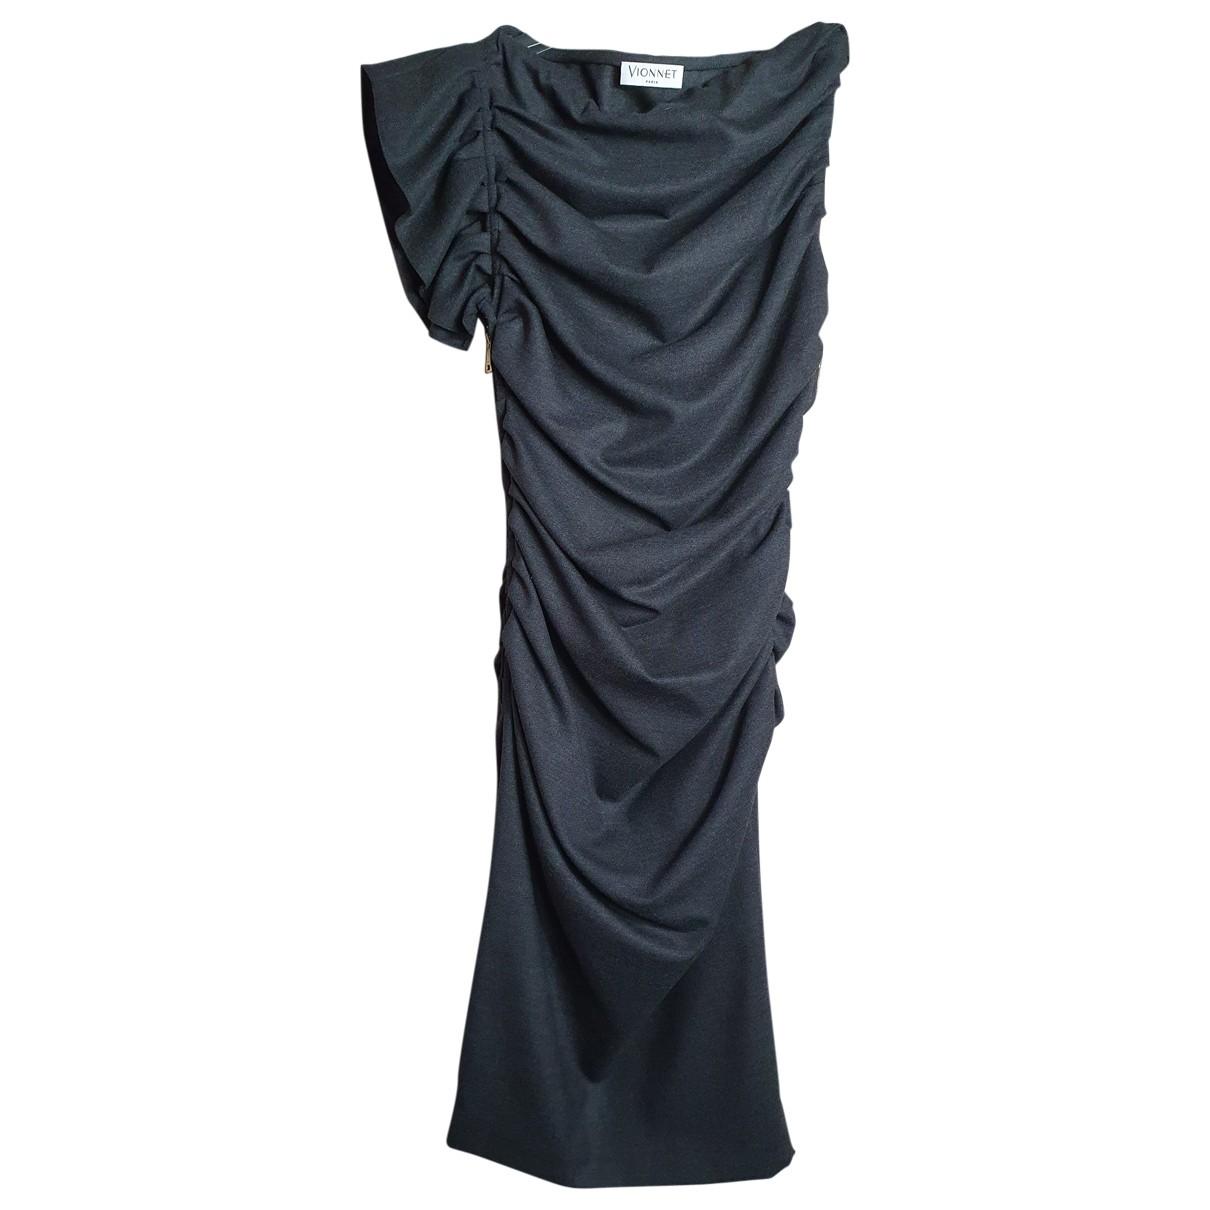 Vionnet \N Kleid in  Anthrazit Wolle